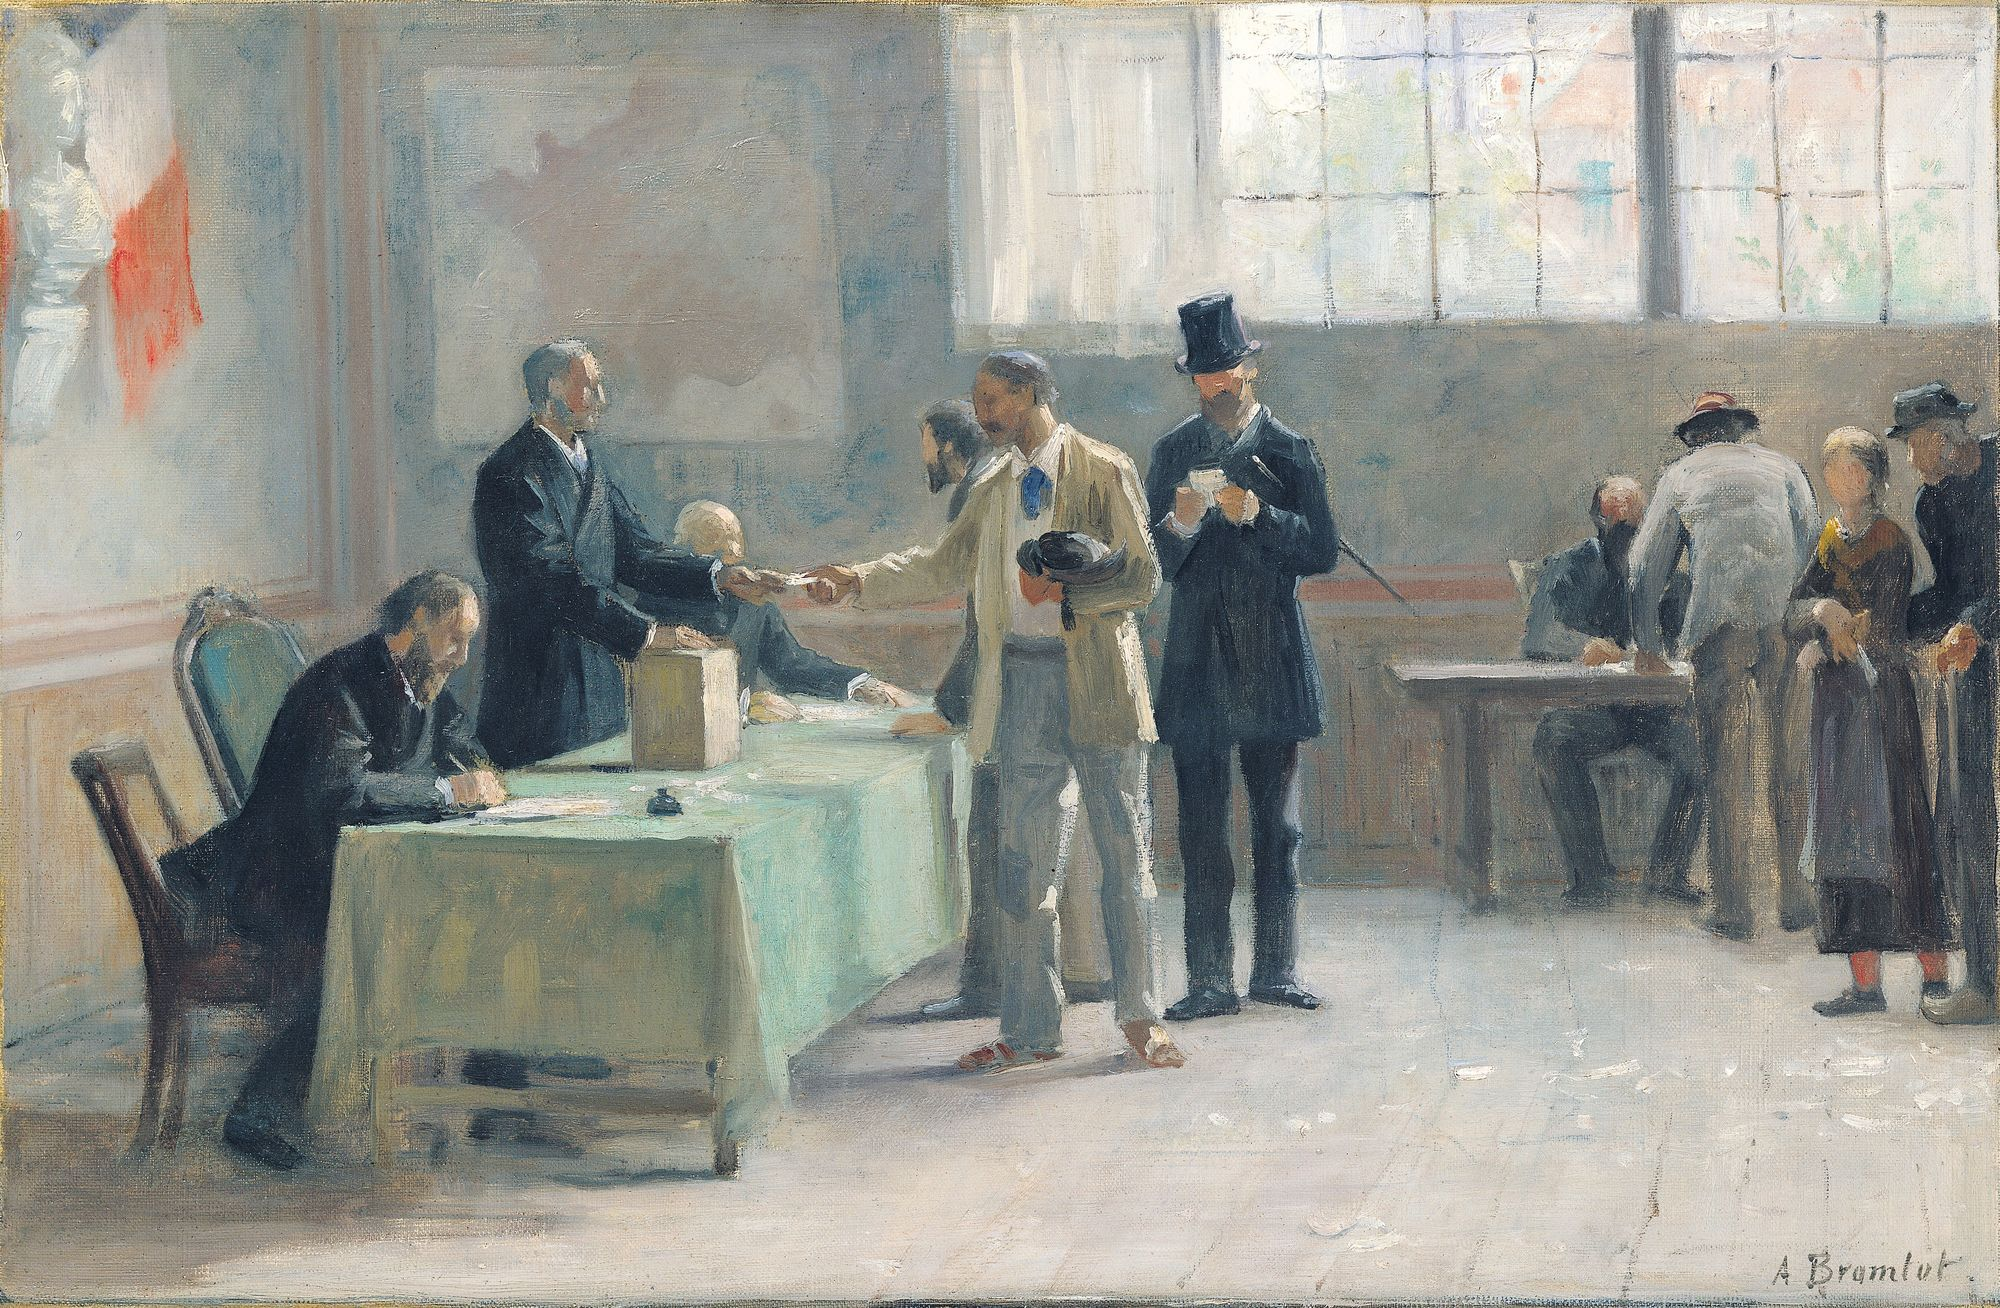 Alfred-Henri Bramtot, Le Suffrage universel